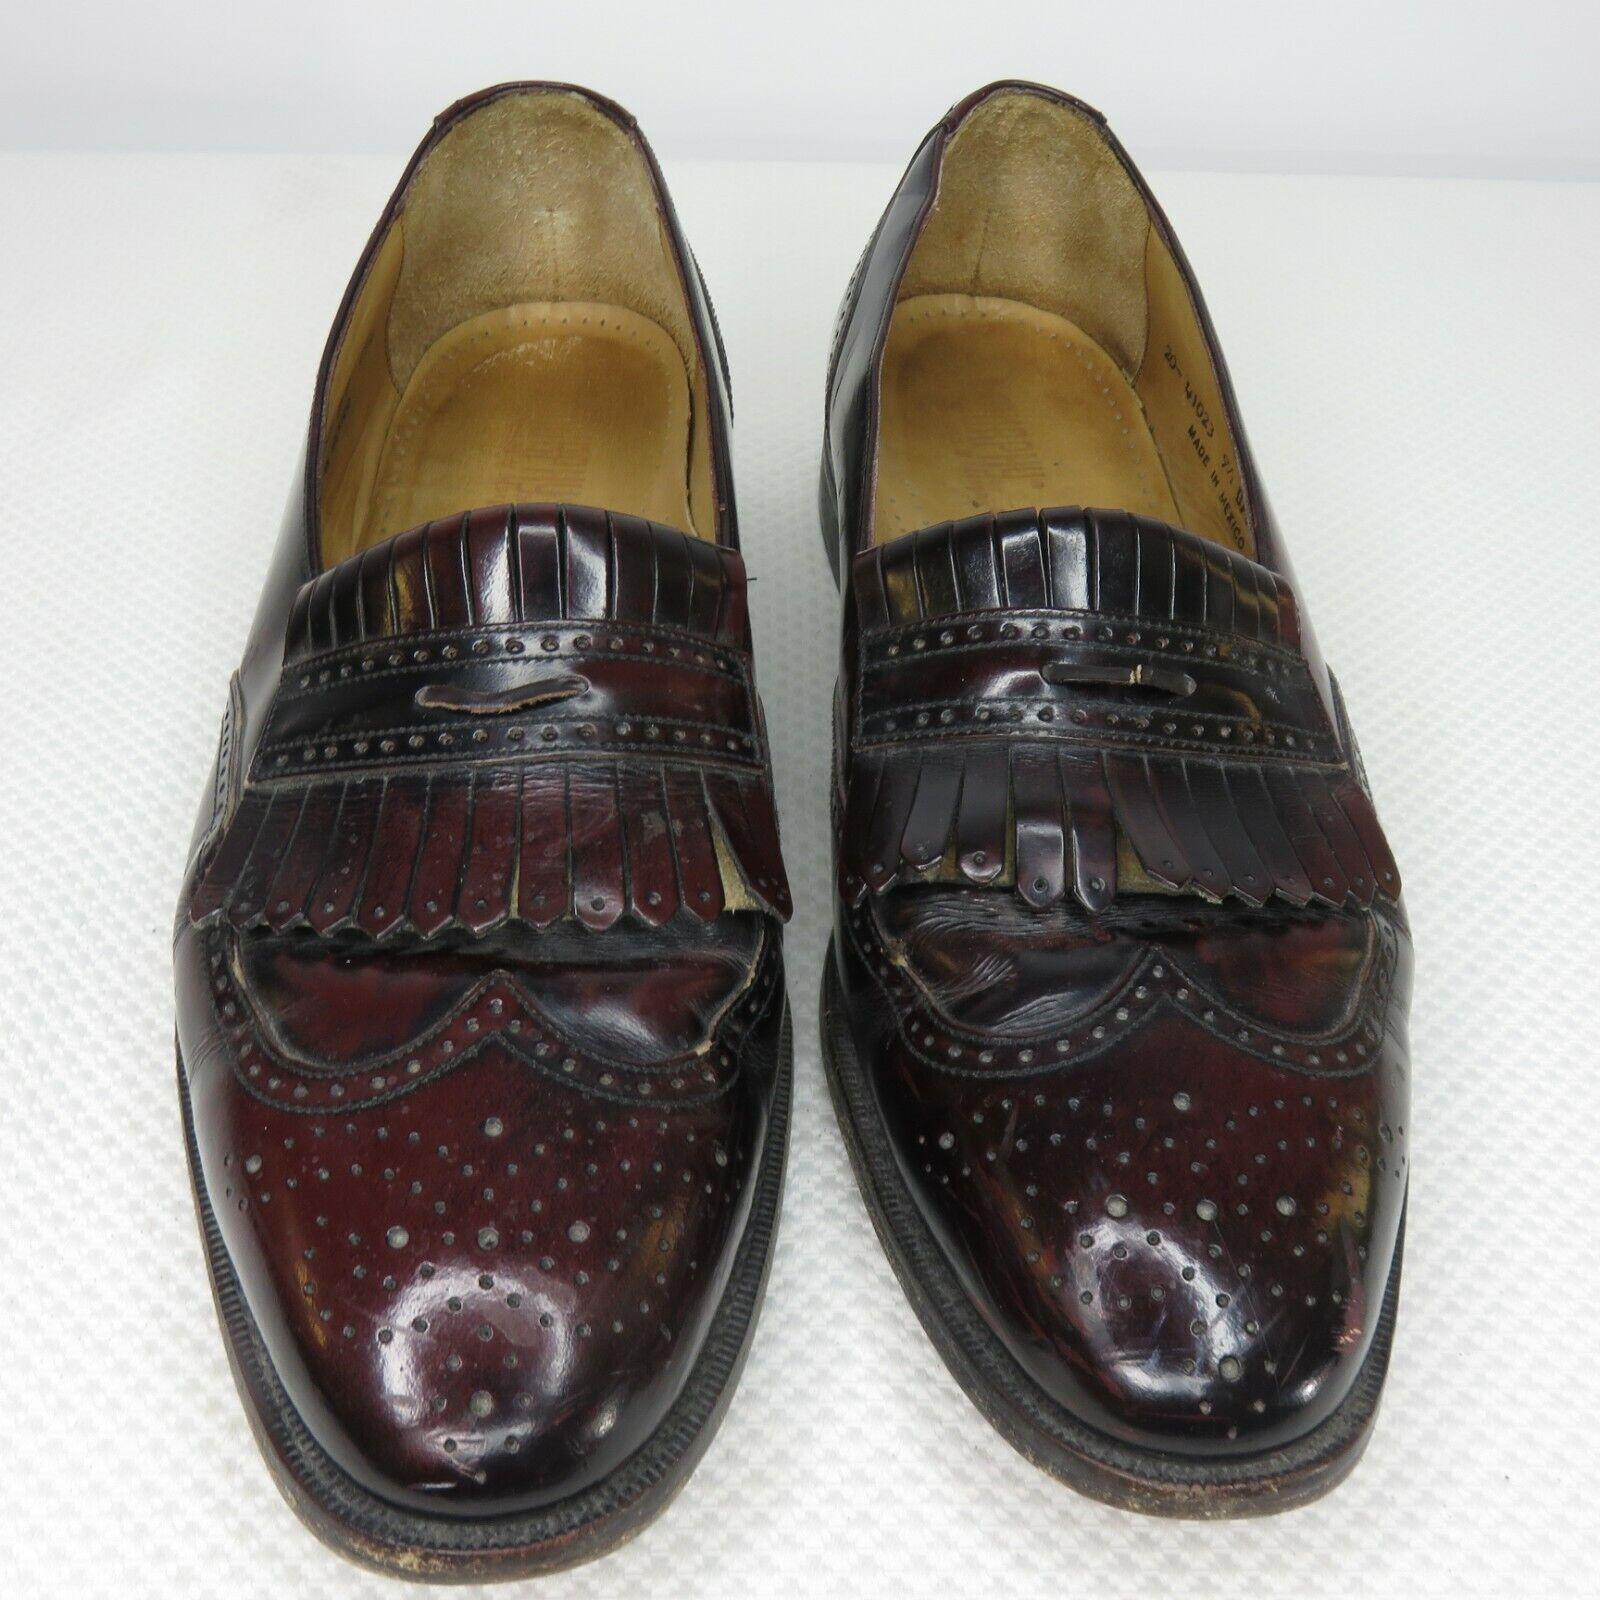 Johnston & Murphy Kiltie Loafers Wingtip Shoes Size 9.5 Cordovan Burgundy